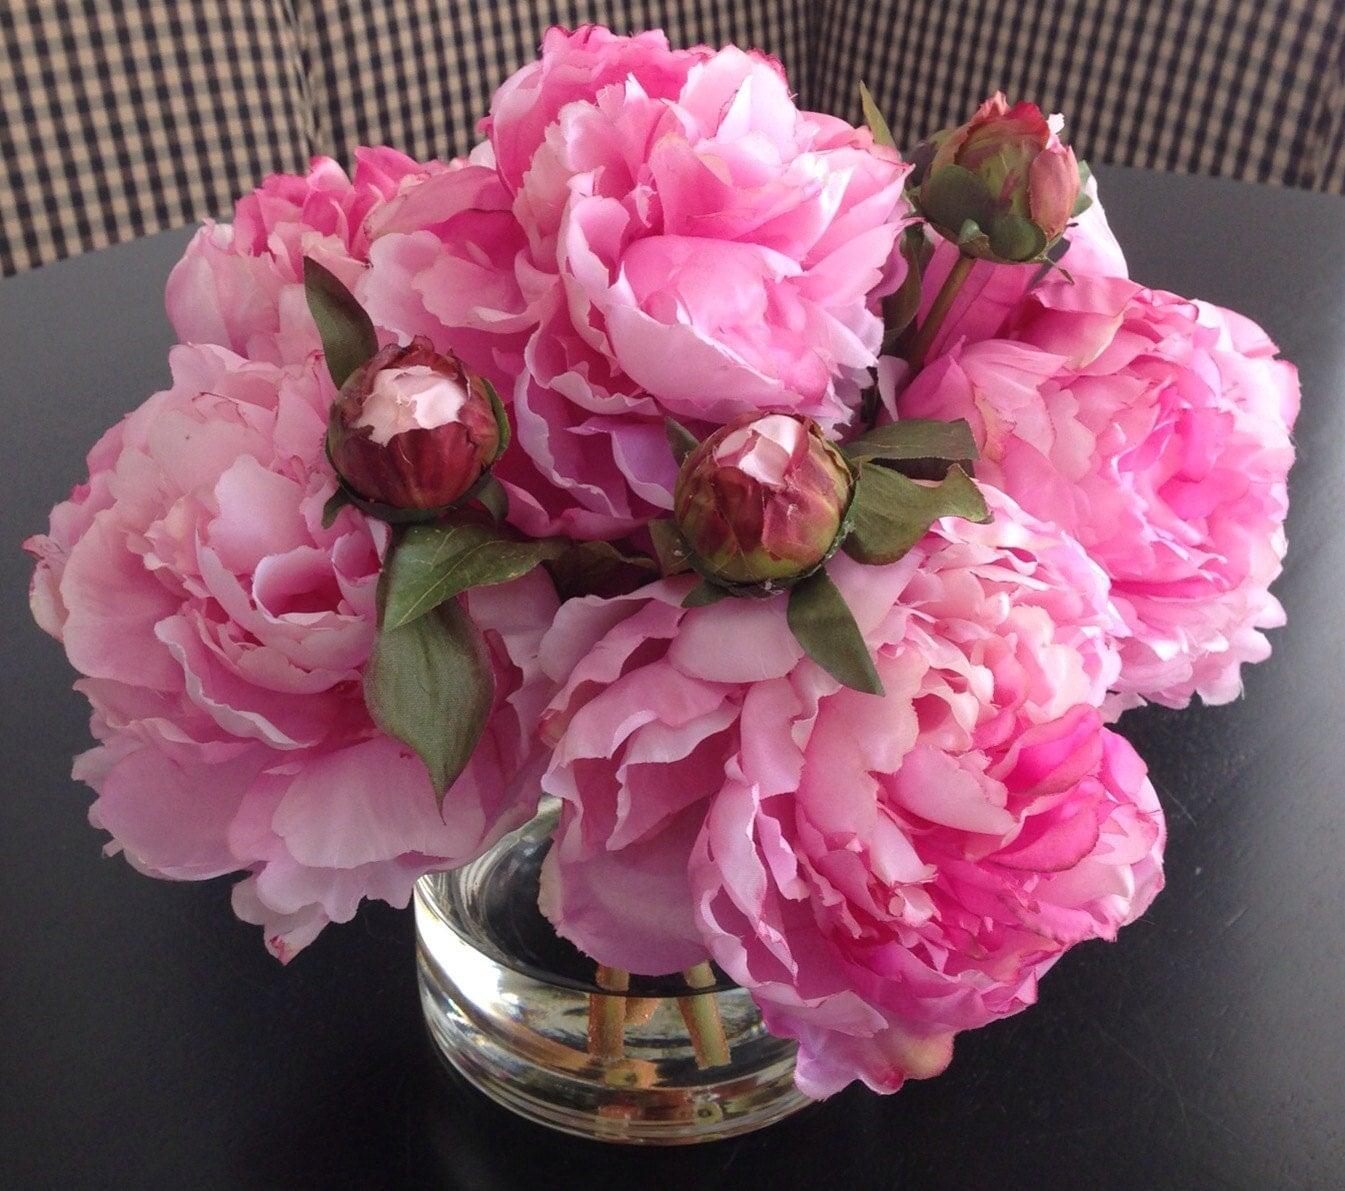 Peony Arrangements: Fine Silk Floral Arrangement Faux Pink Peonies In Round Vase